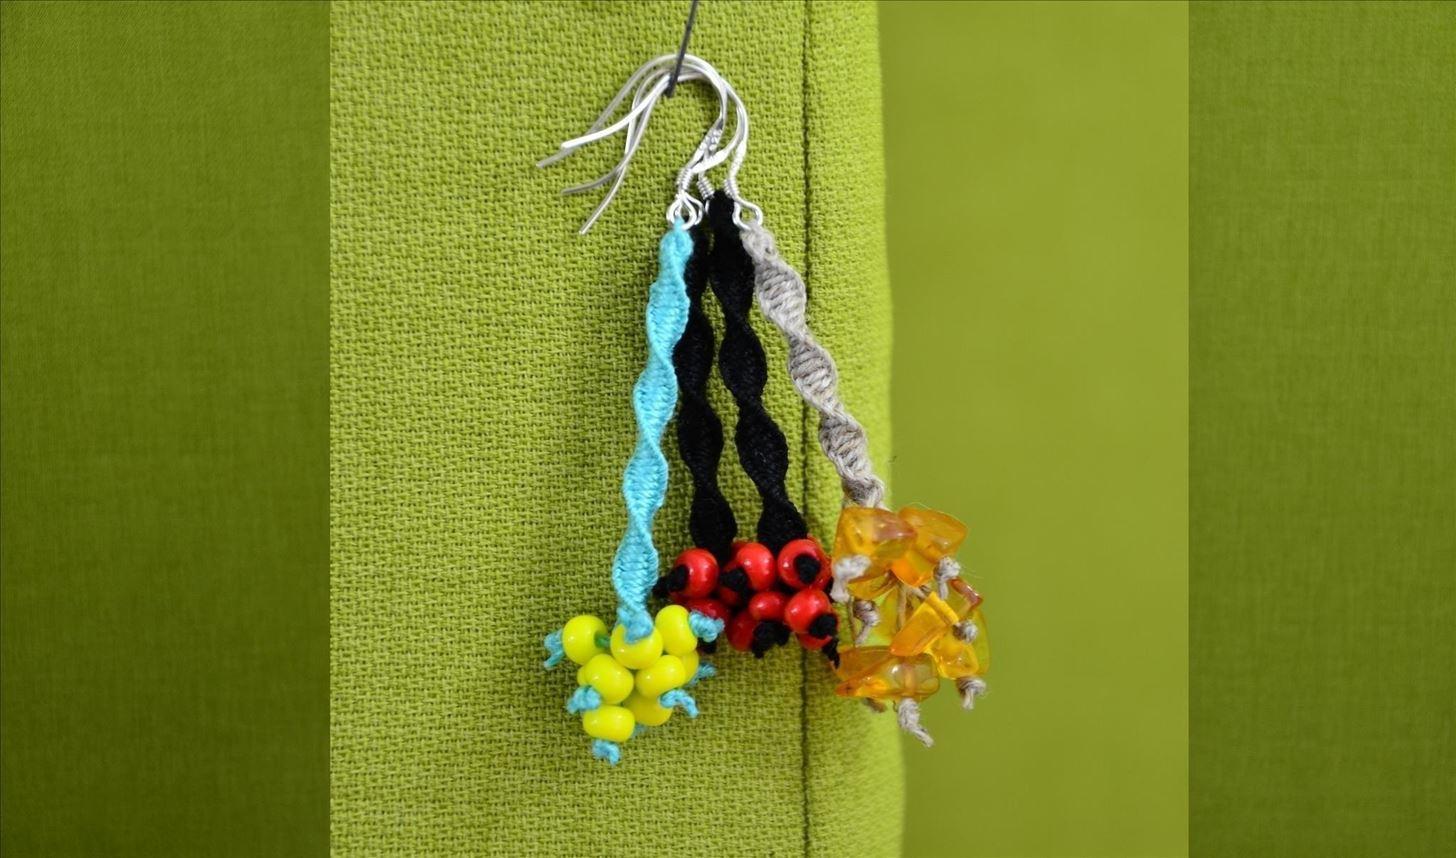 How to Make Macrame Earrings with Beads